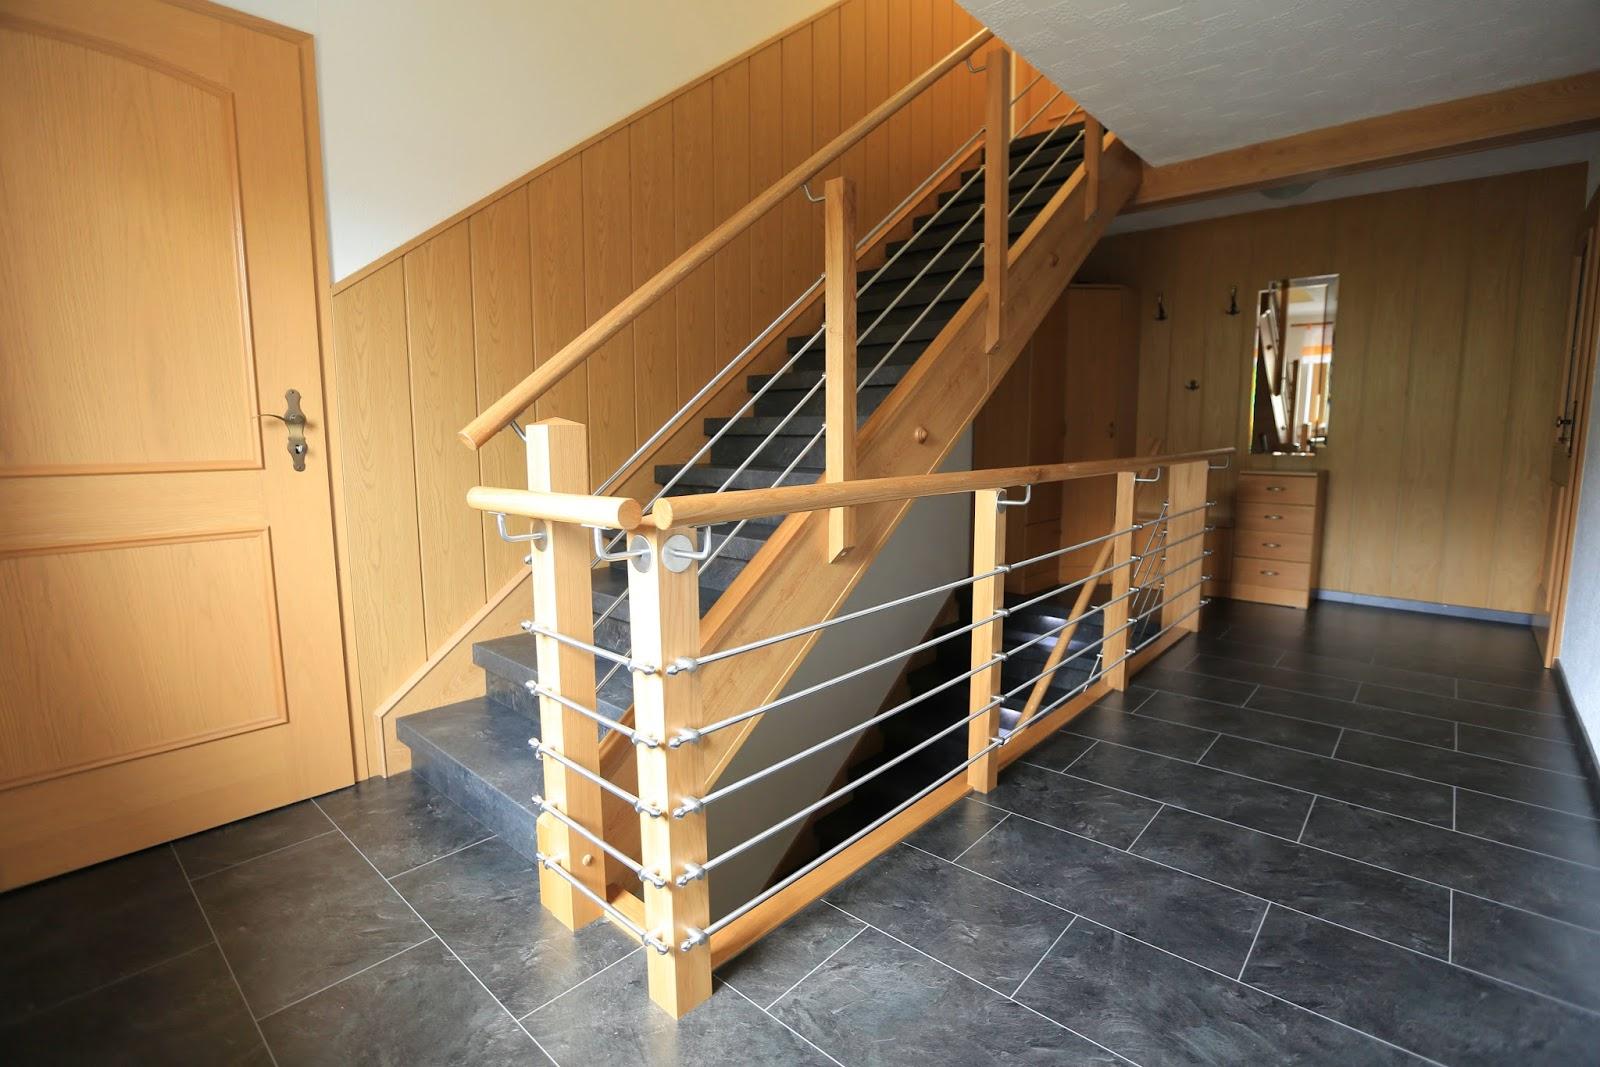 Favorit H&K Treppenrenovierung: Treppenrenovierung mit einem Holz KK11